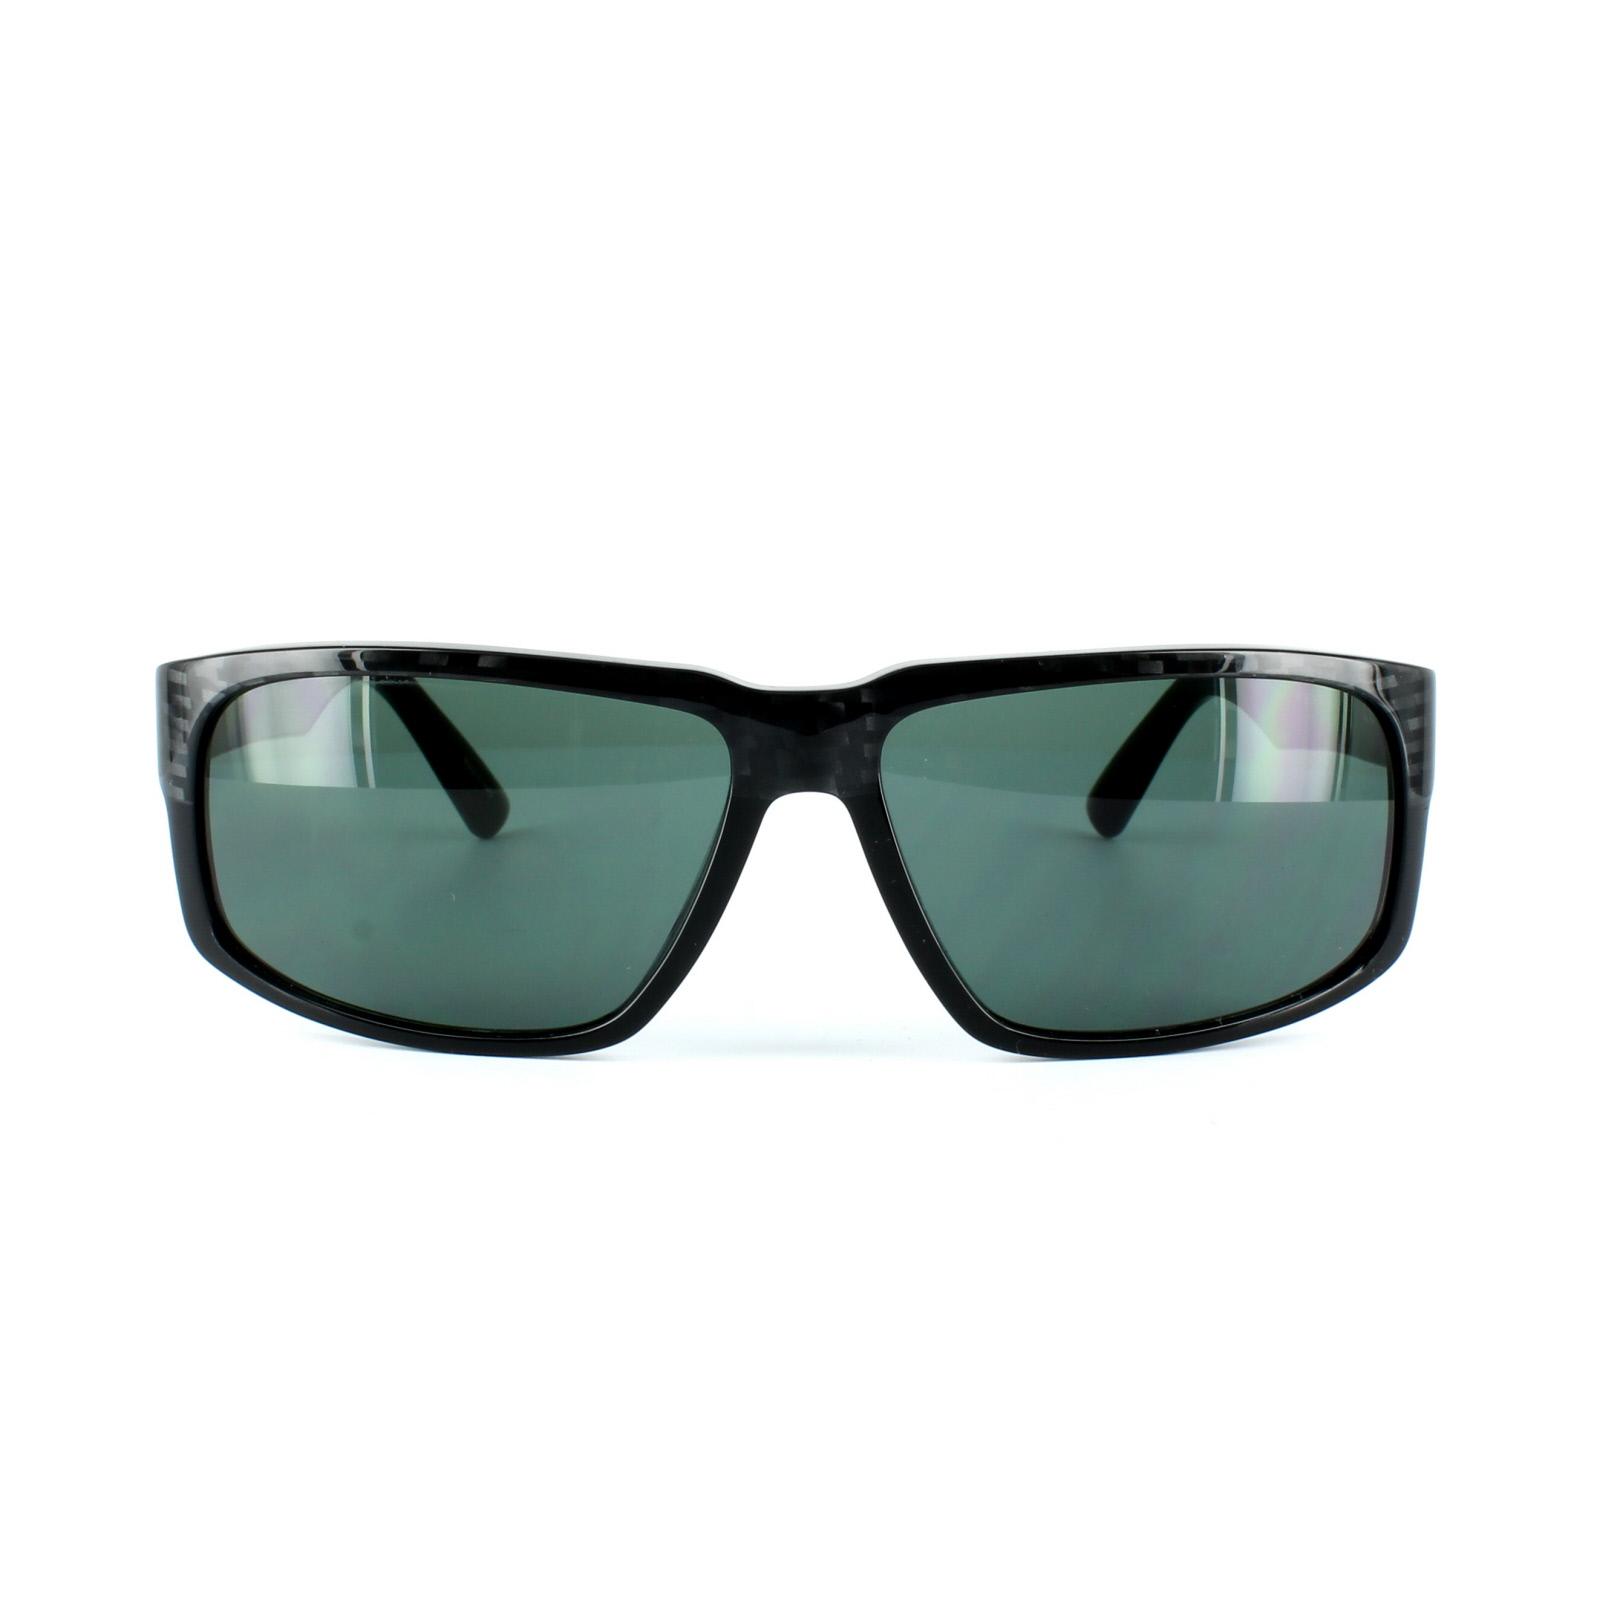 Porsche Design Sunglasses P8547 A Carbon Amp Black Green Ebay